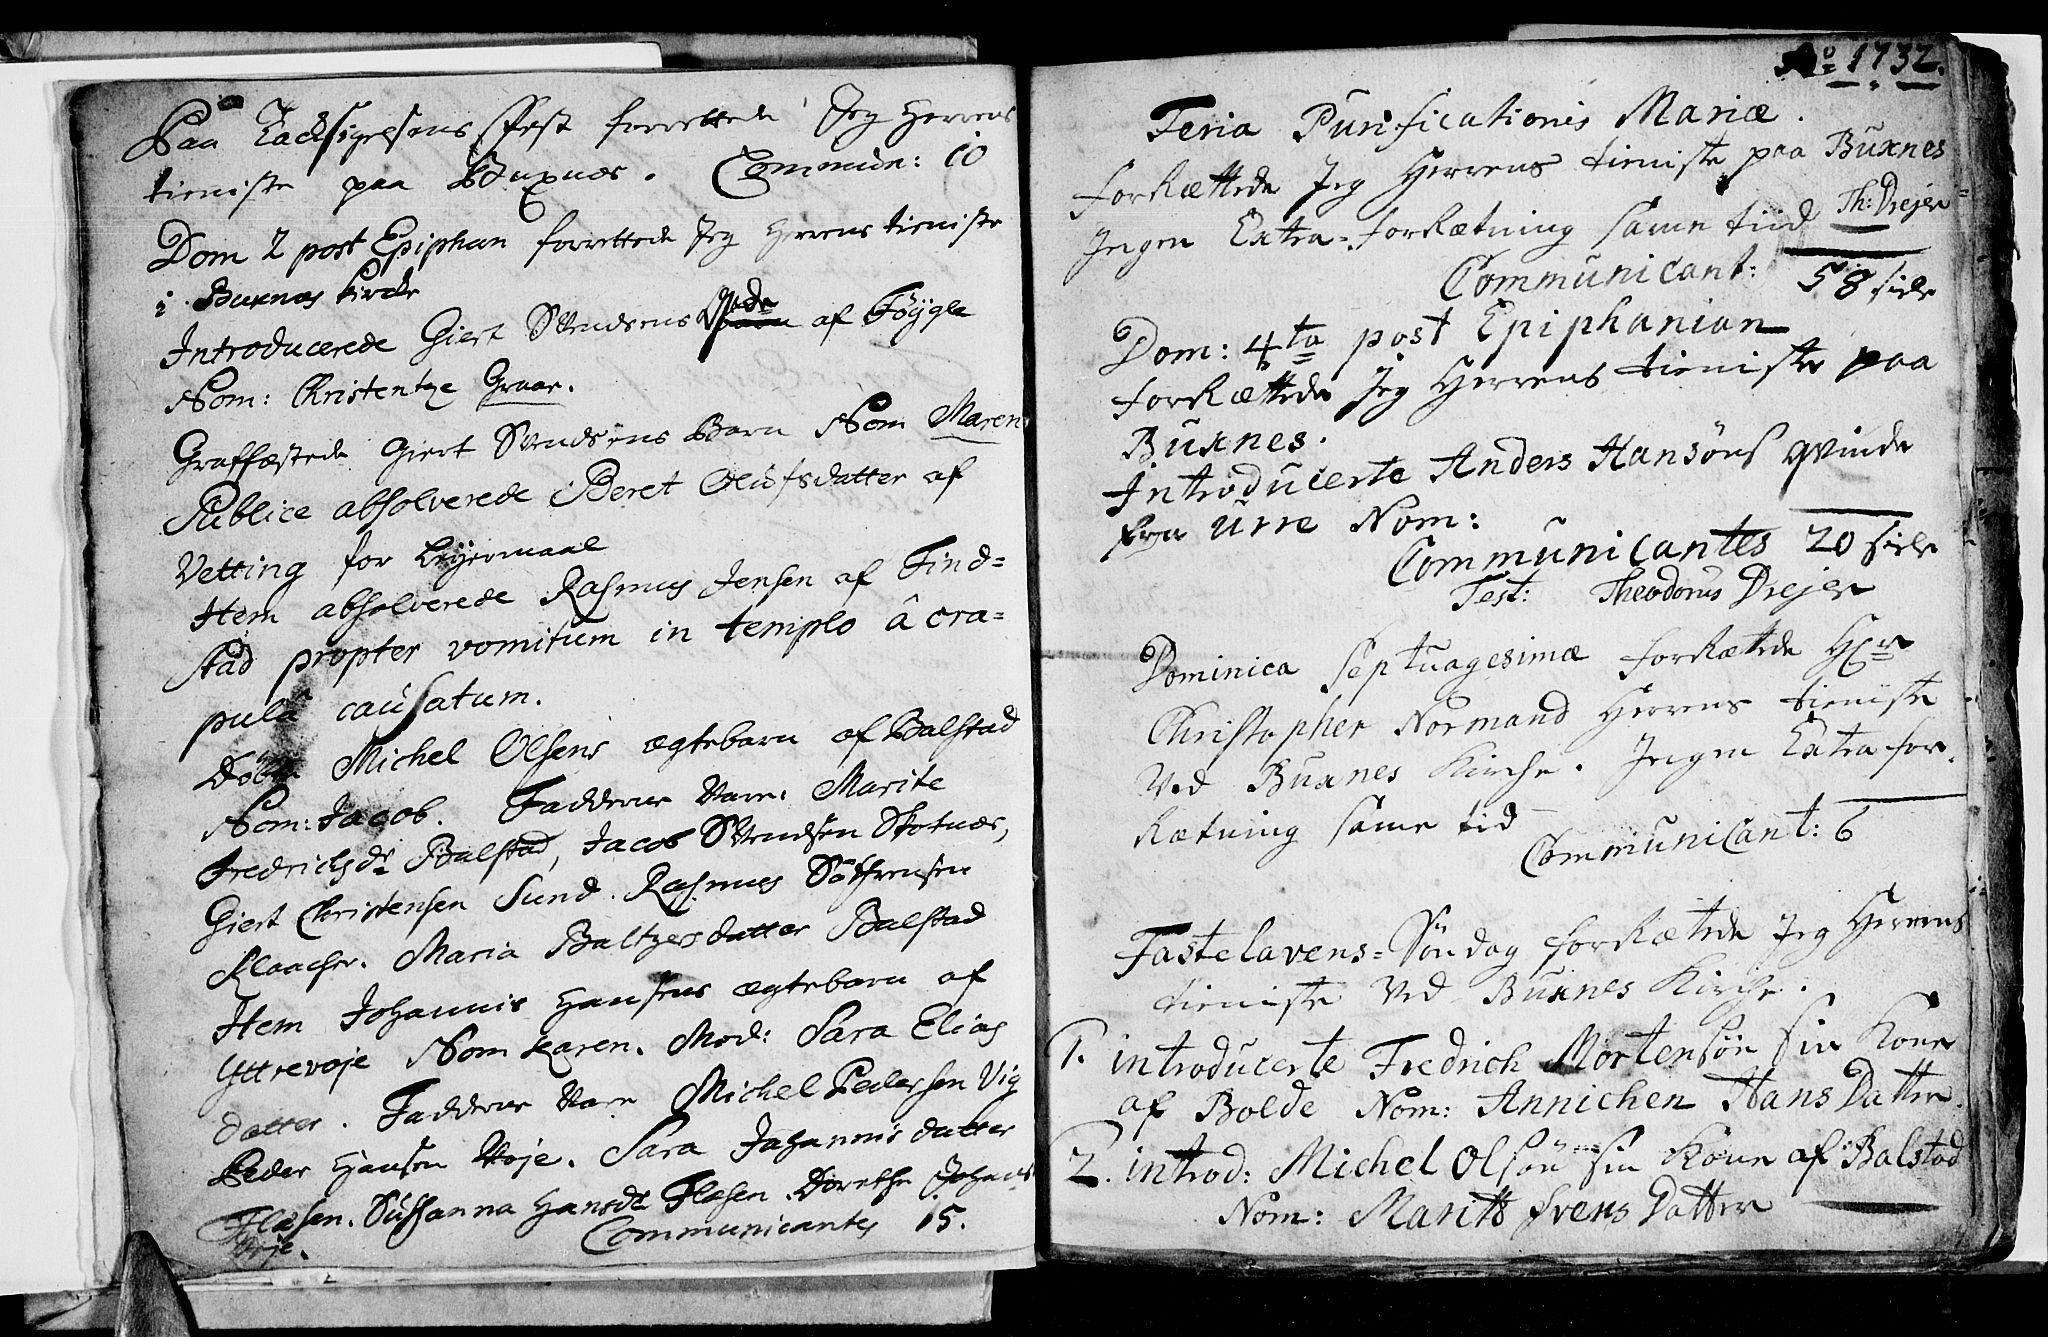 SAT, Ministerialprotokoller, klokkerbøker og fødselsregistre - Nordland, 881/L1148: Ministerialbok nr. 881A01, 1732-1744